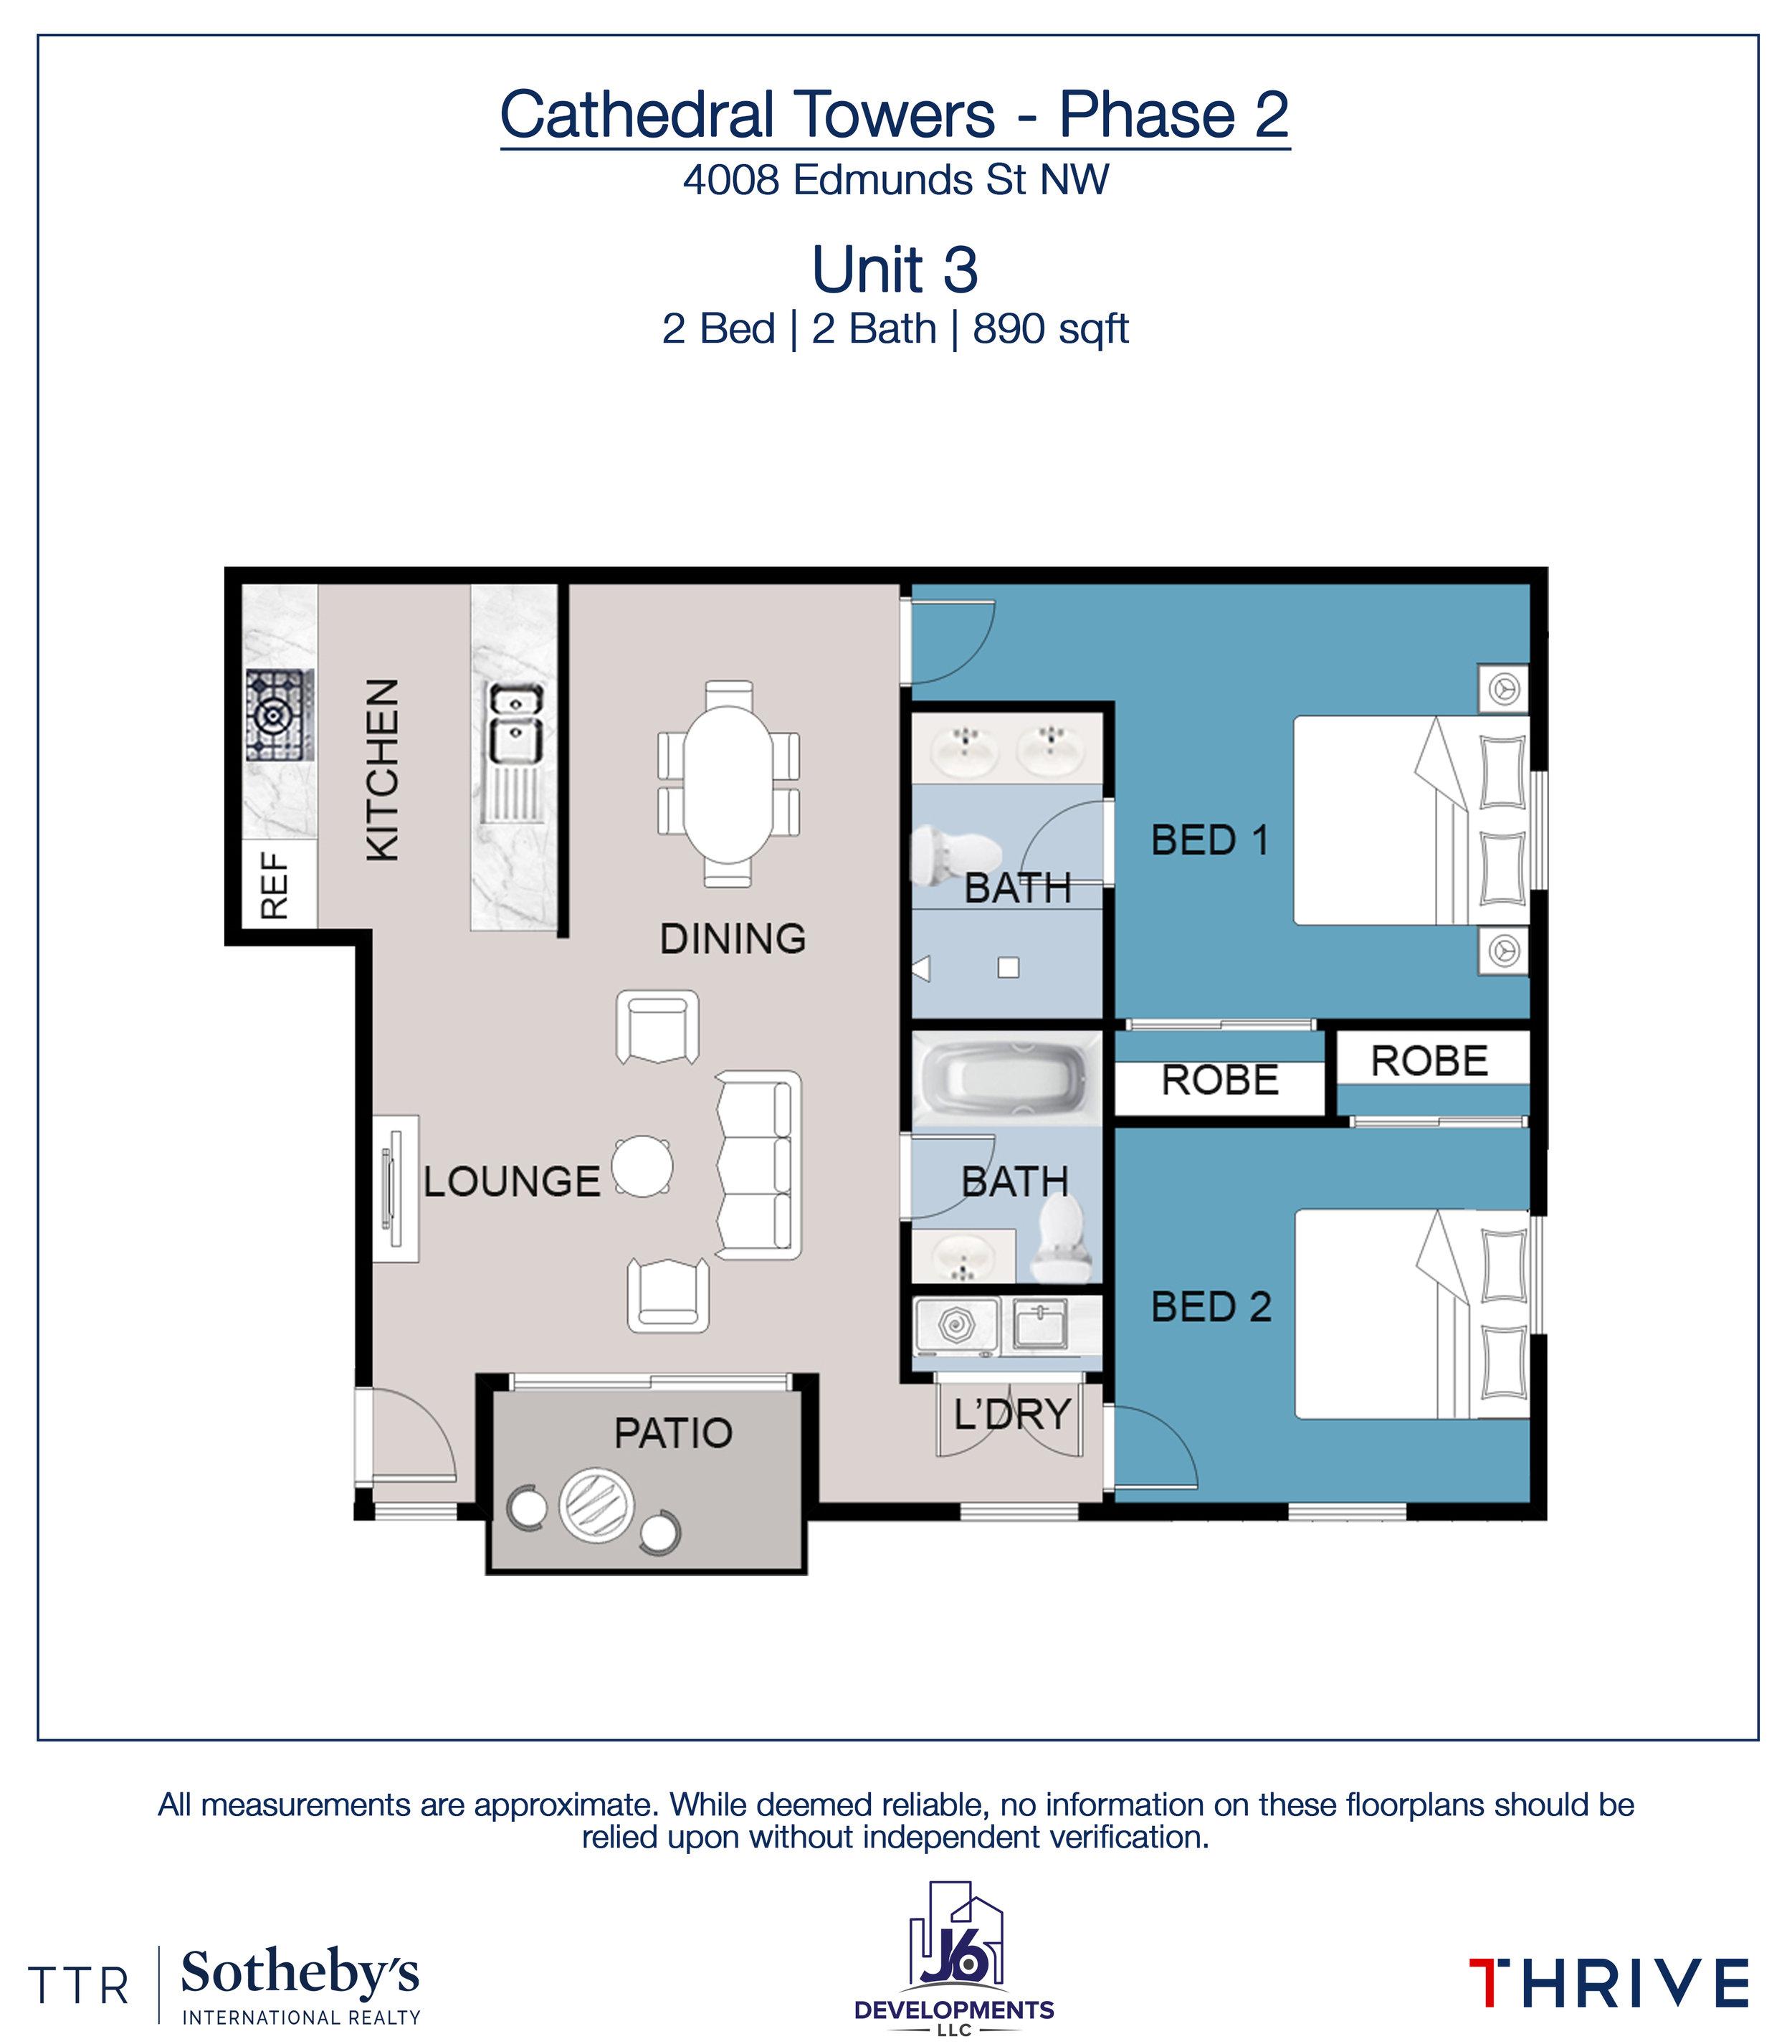 4008 Edmunds Unit 3 - Floorplan - 7.31.18.jpg